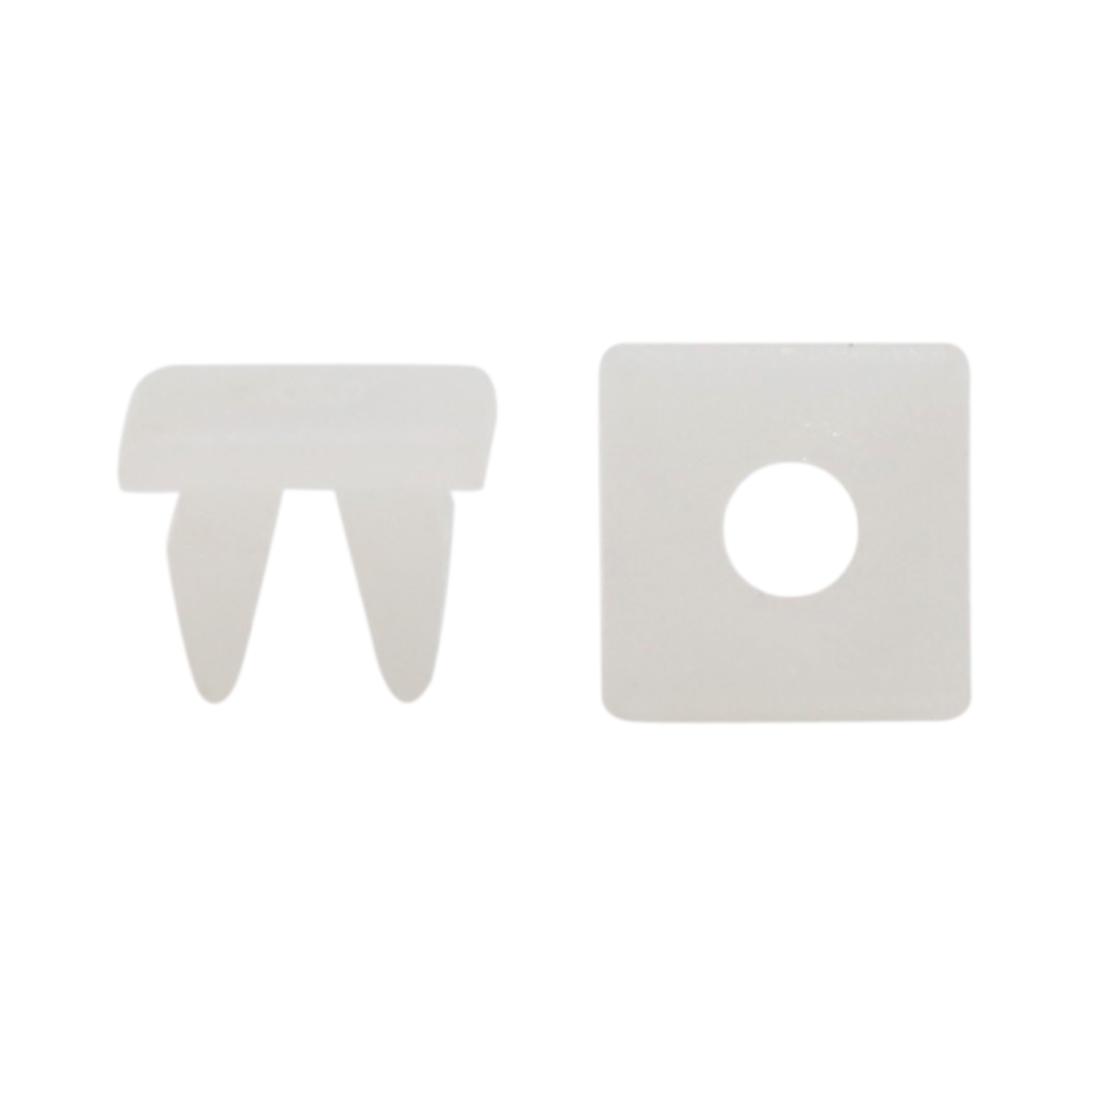 100Pcs Universal White Plastic Rivet Car Trim Panel Hood Fastener 7mm x 6mm Hole